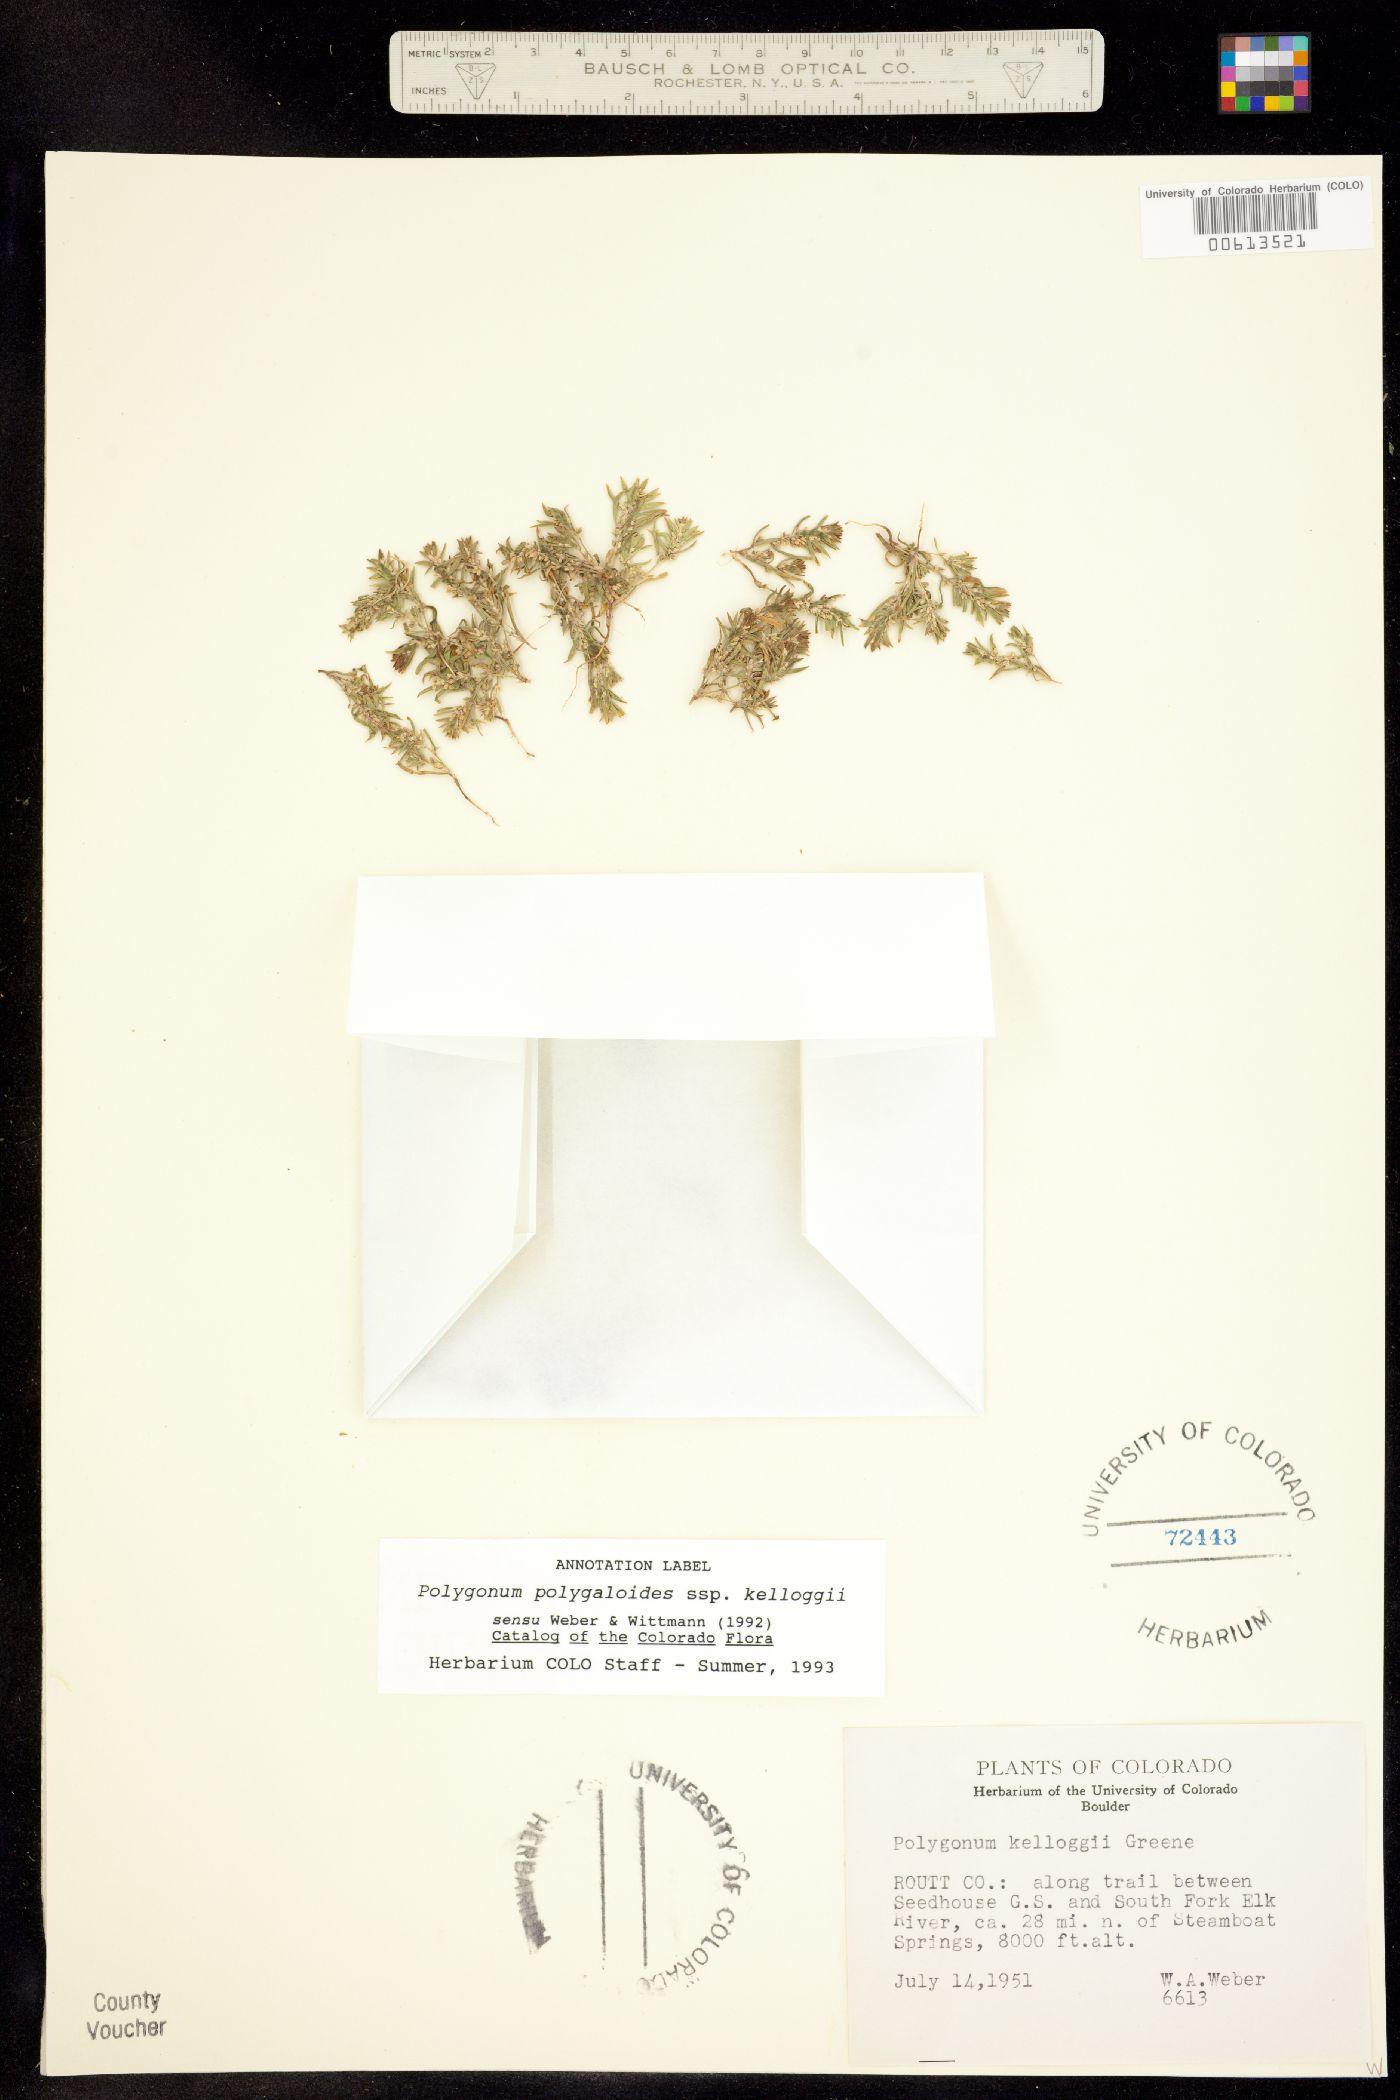 Polygonum polygaloides ssp. kelloggii image